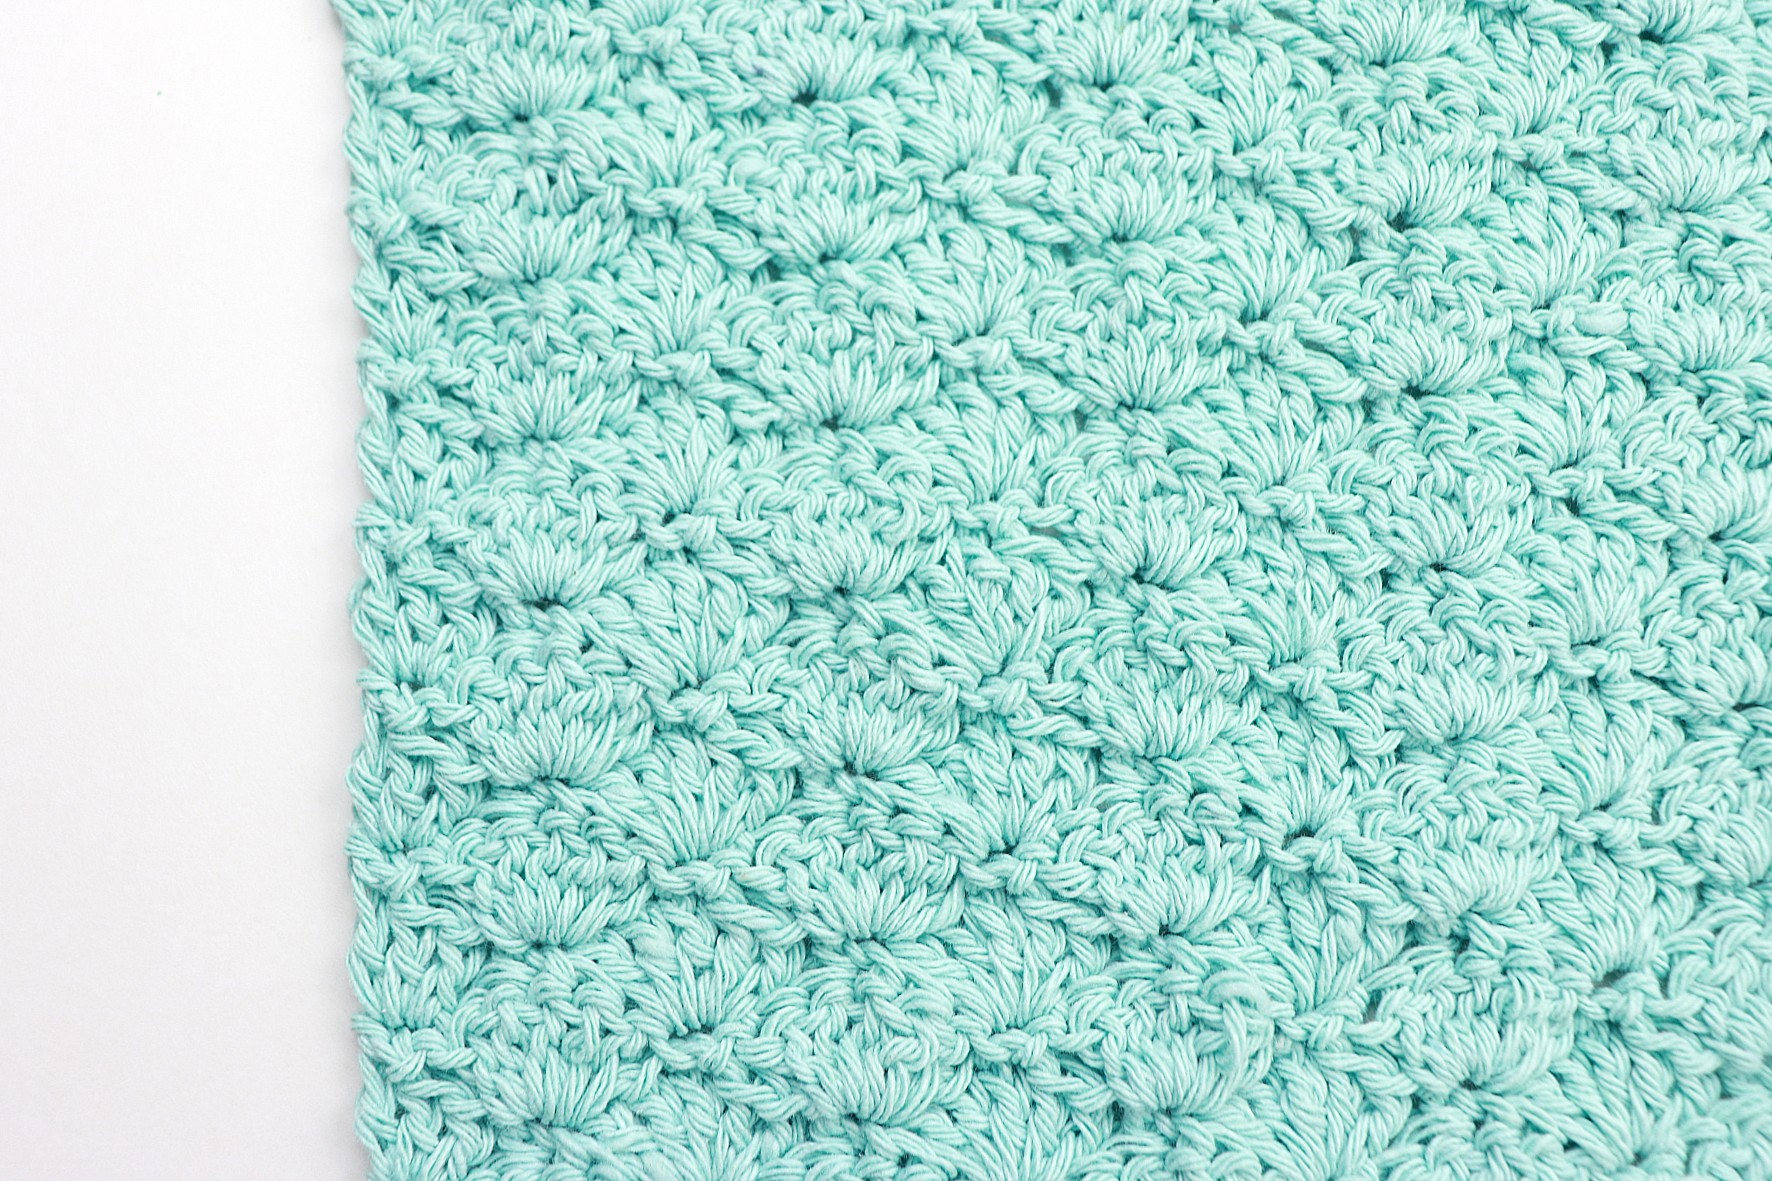 Basic Shell Stitch Washcloth Crochet Pattern For Beginners To Practice The Basic Stitches Sigoni Macaroni